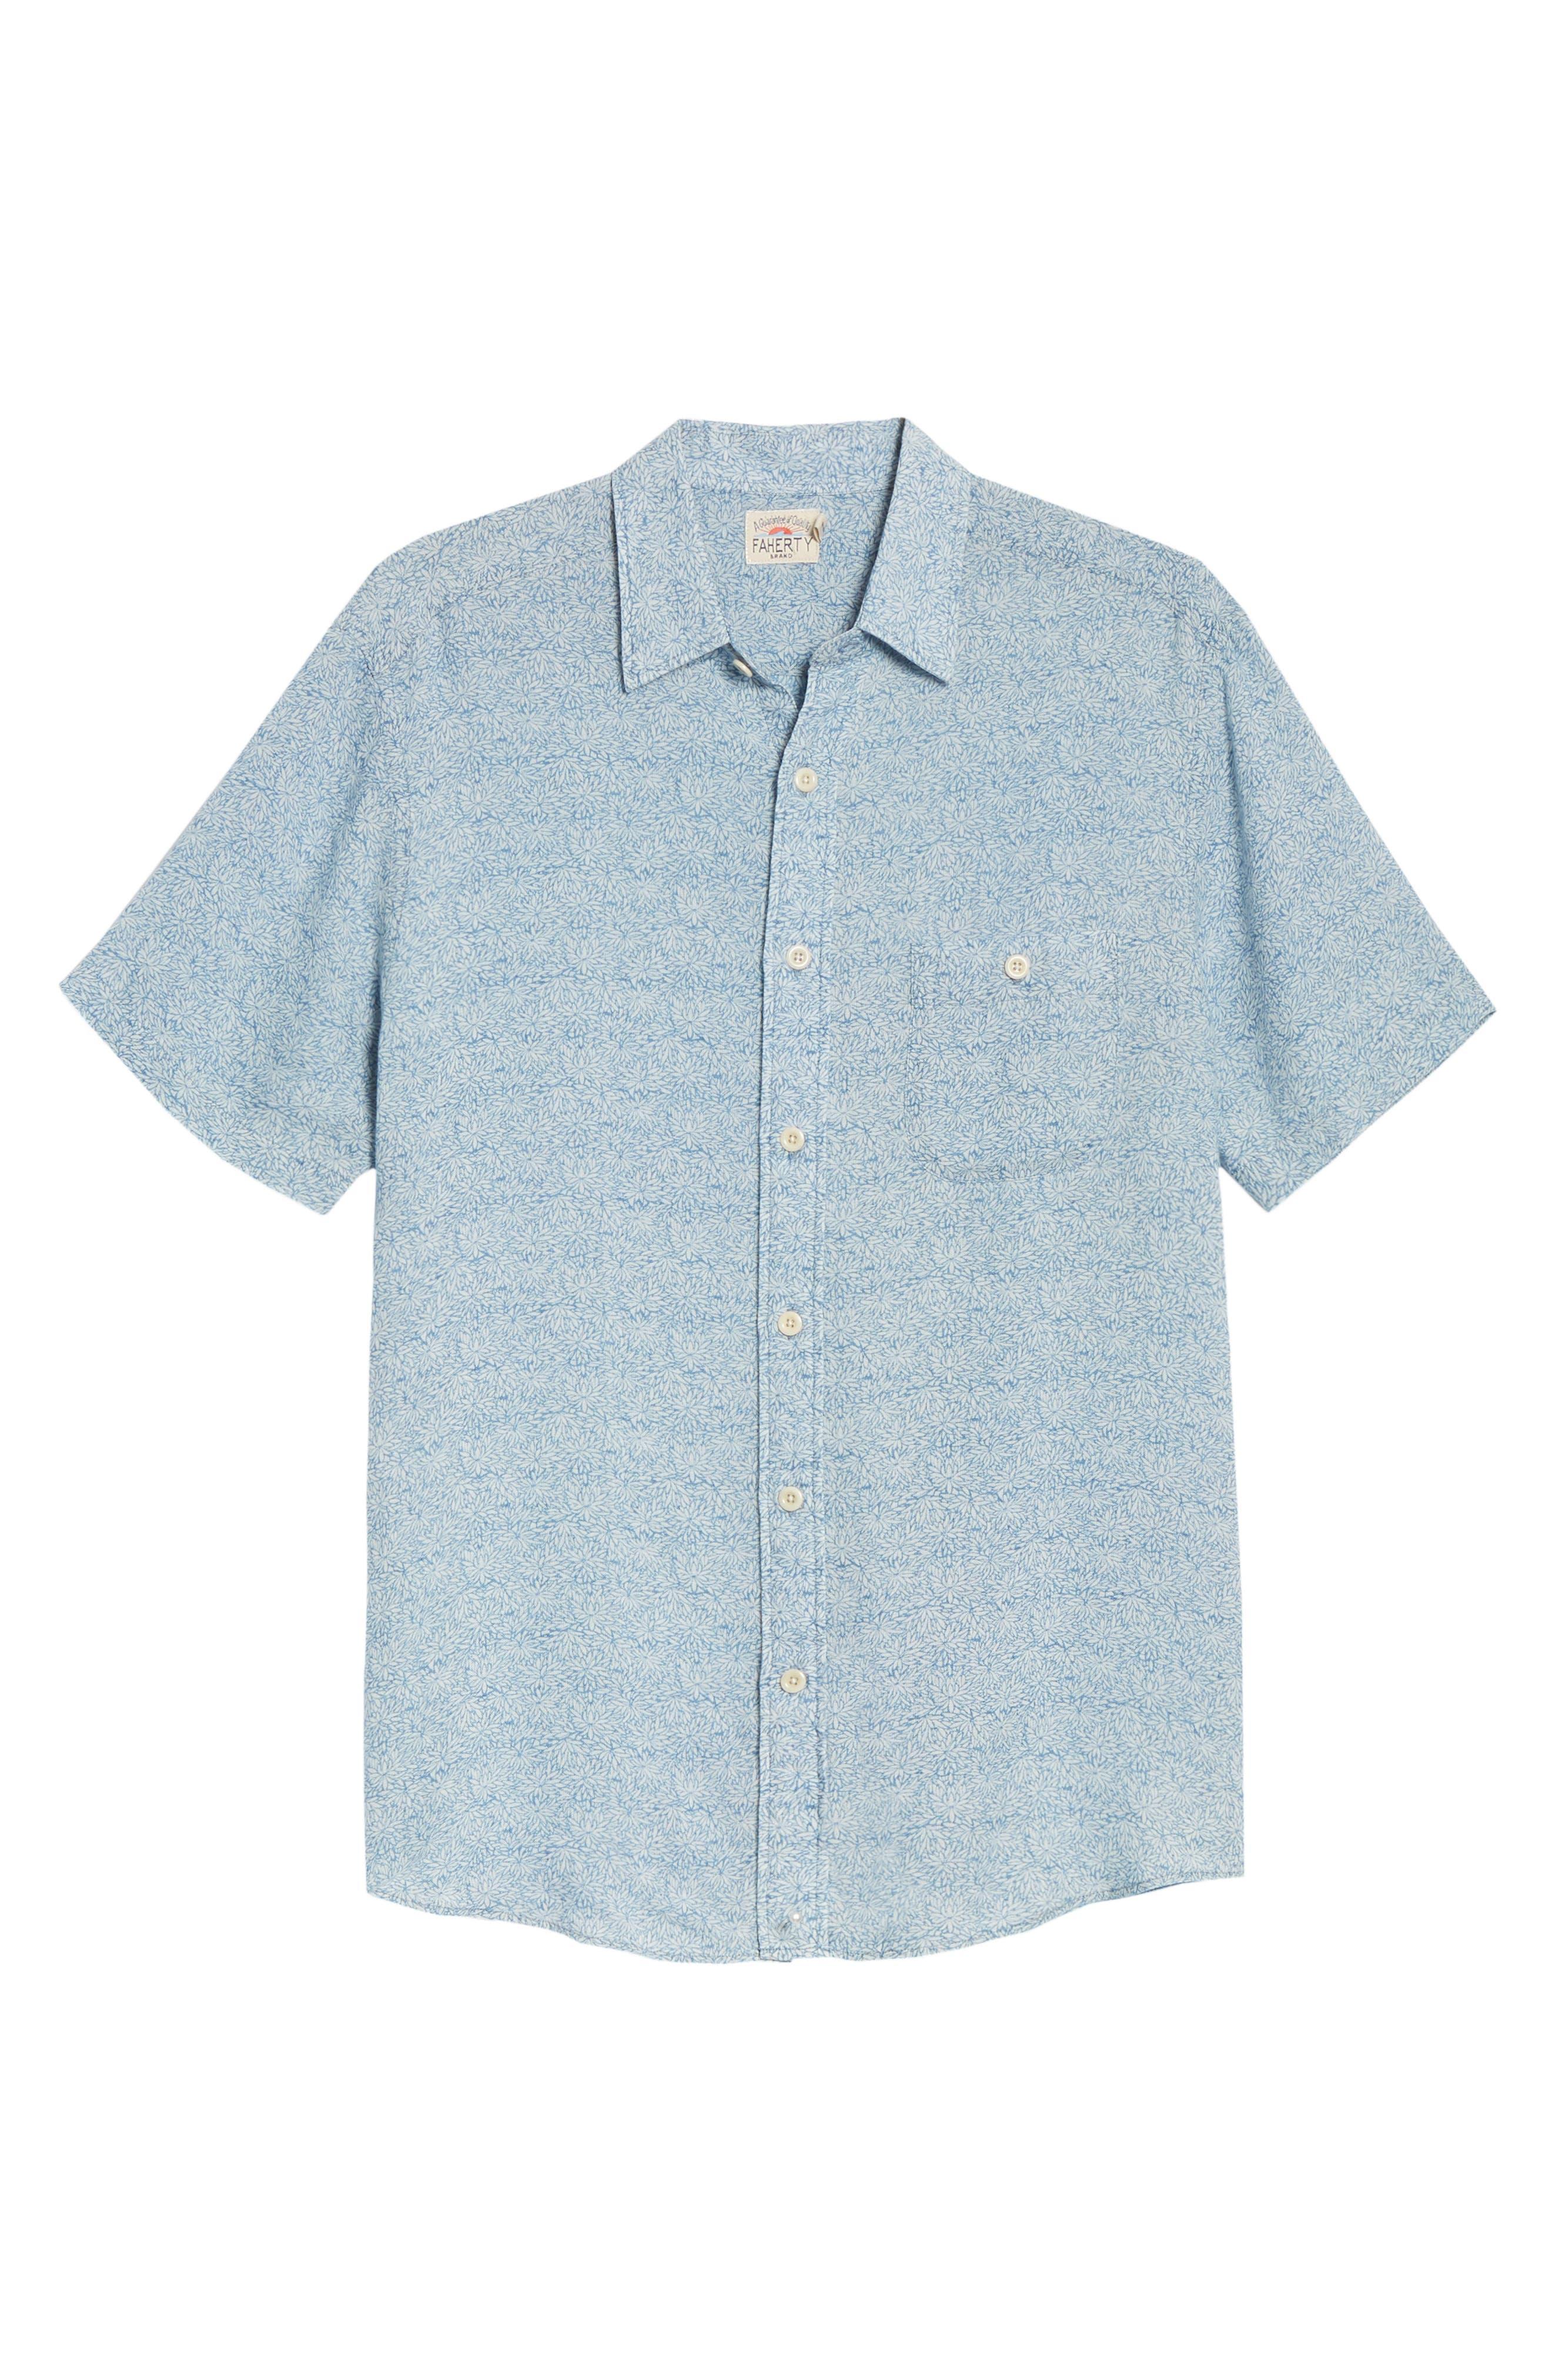 Playa Short Sleeve Button-Up Floral Shirt